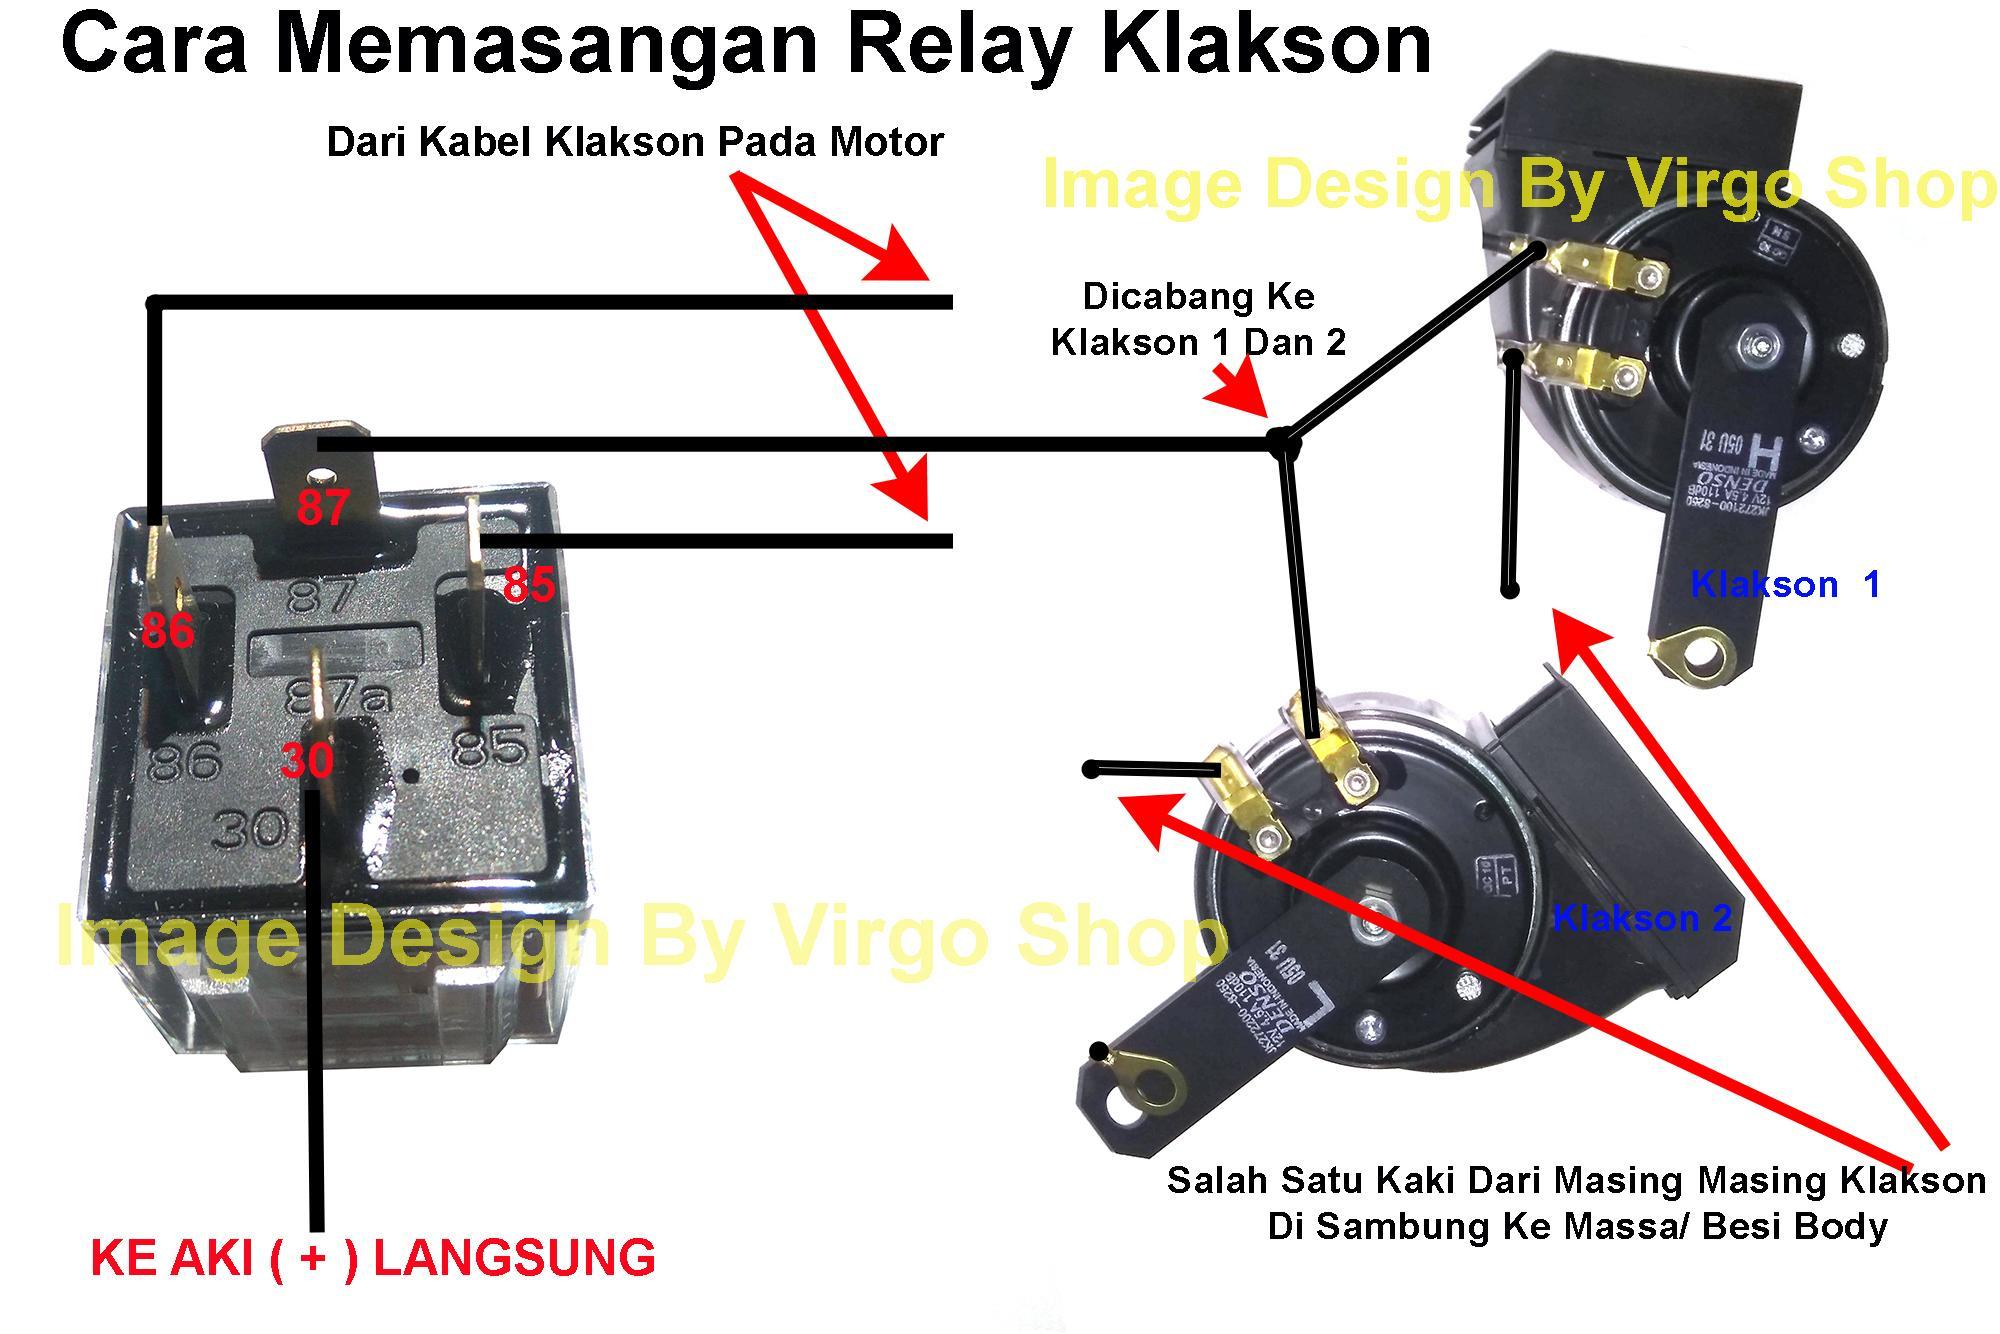 Denso tipe272000 klakson keong 12v waterproofanti air gratis wiring relay klaksong ccuart Images